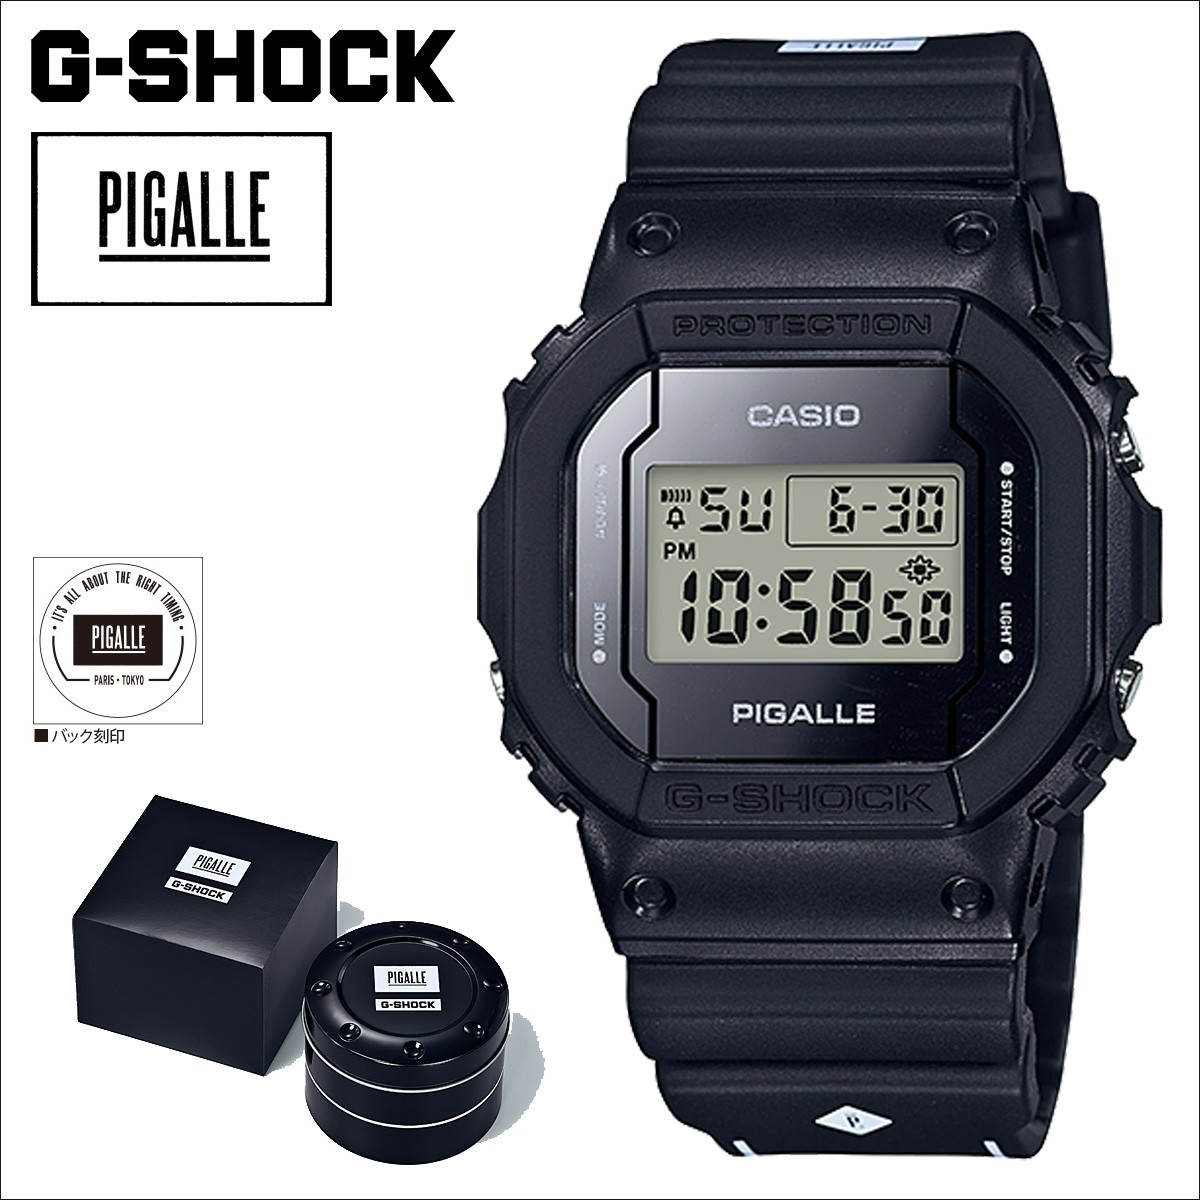 【SOLD OUT】 カシオ CASIO G-SHOCK 腕時計 ピガール DW 5600PGB 1JR PIGALLE ジーショック G-ショック Gショック メンズ ブラック [12/28 再入荷]